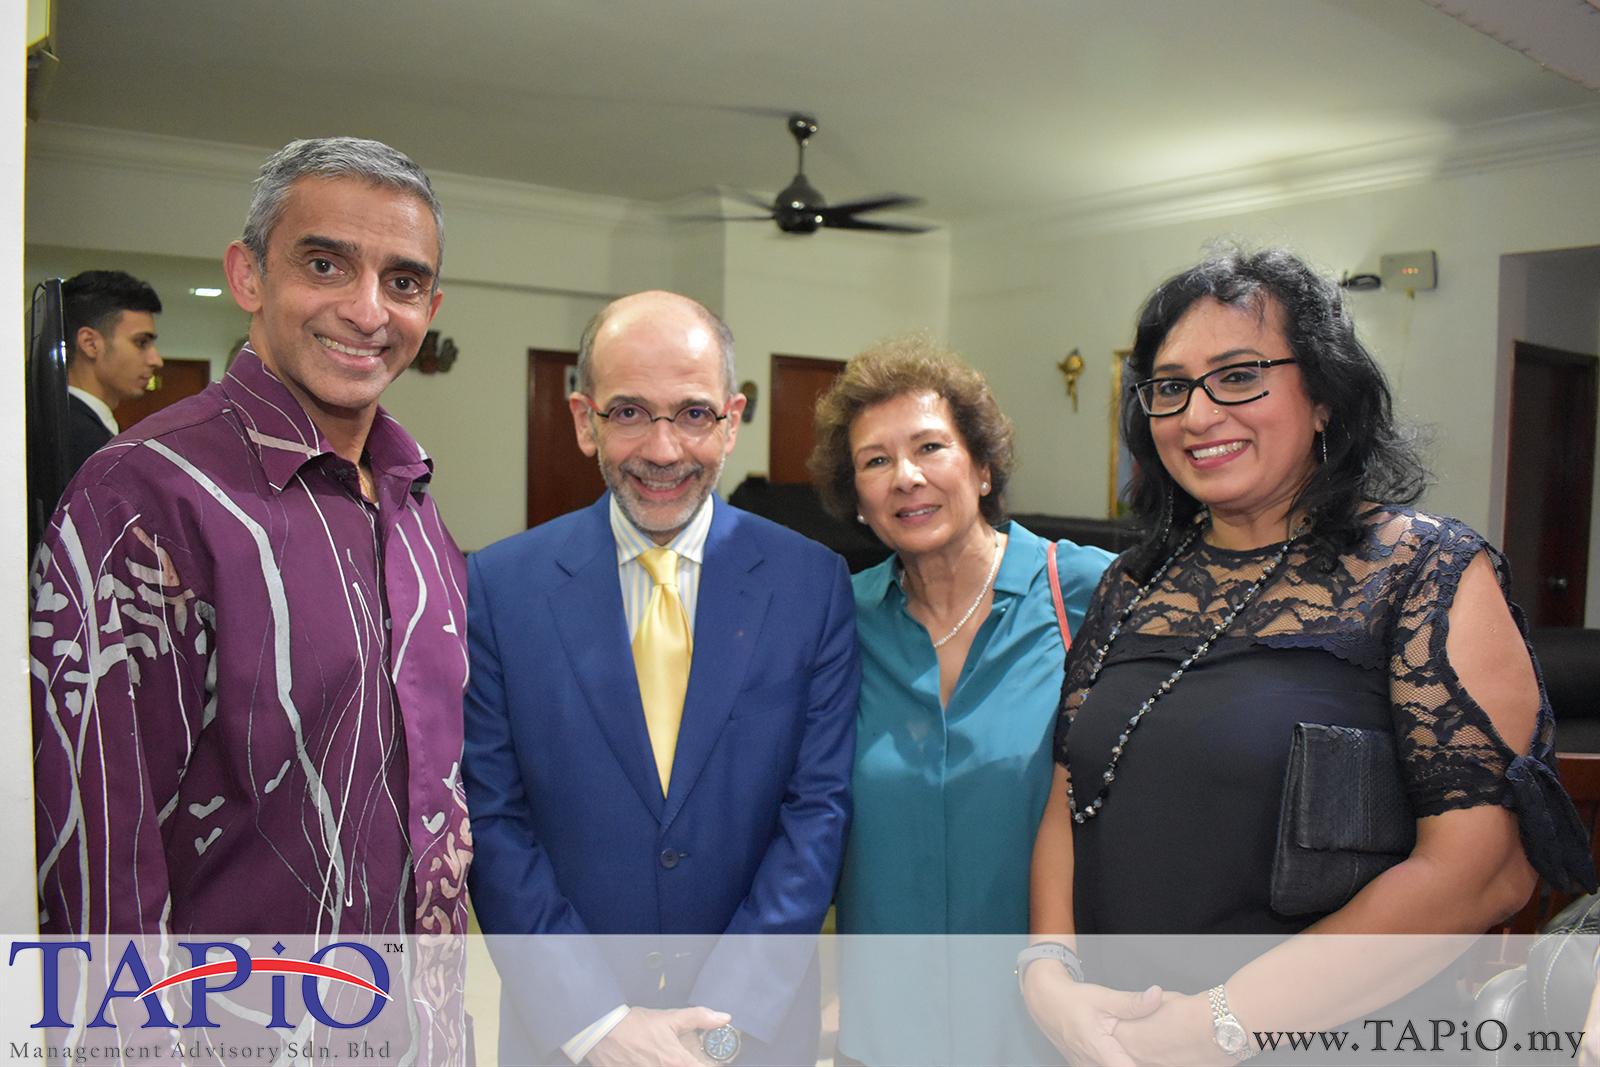 Ambassador's Night at Schutte's Residence - 20/09/2018 (6)